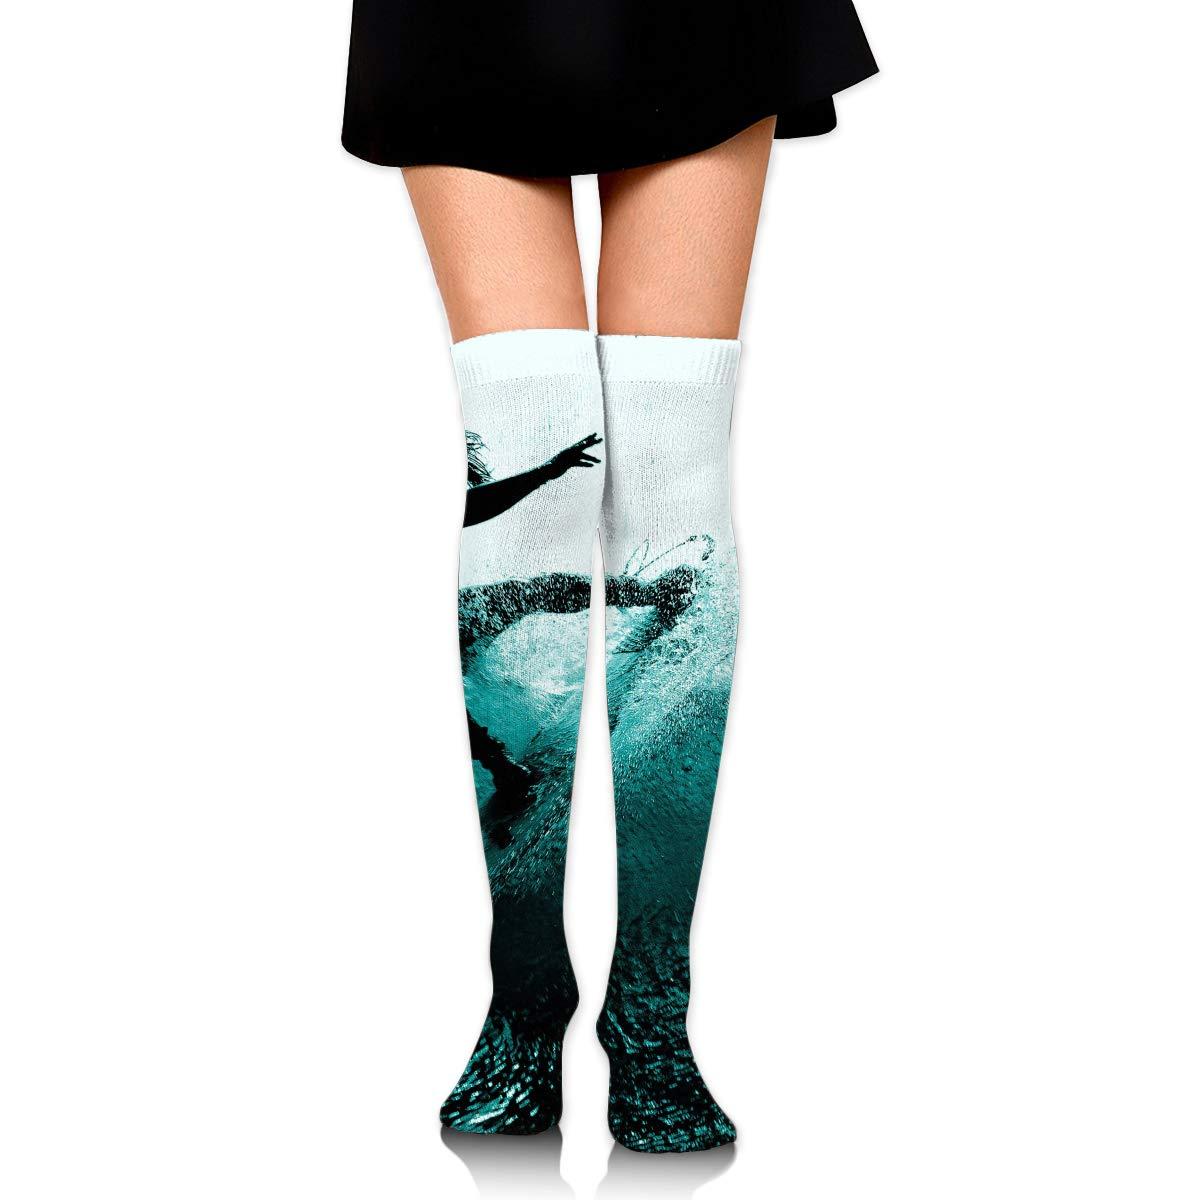 High Elasticity Girl Cotton Knee High Socks Uniform Summer Surfing Fun Women Tube Socks